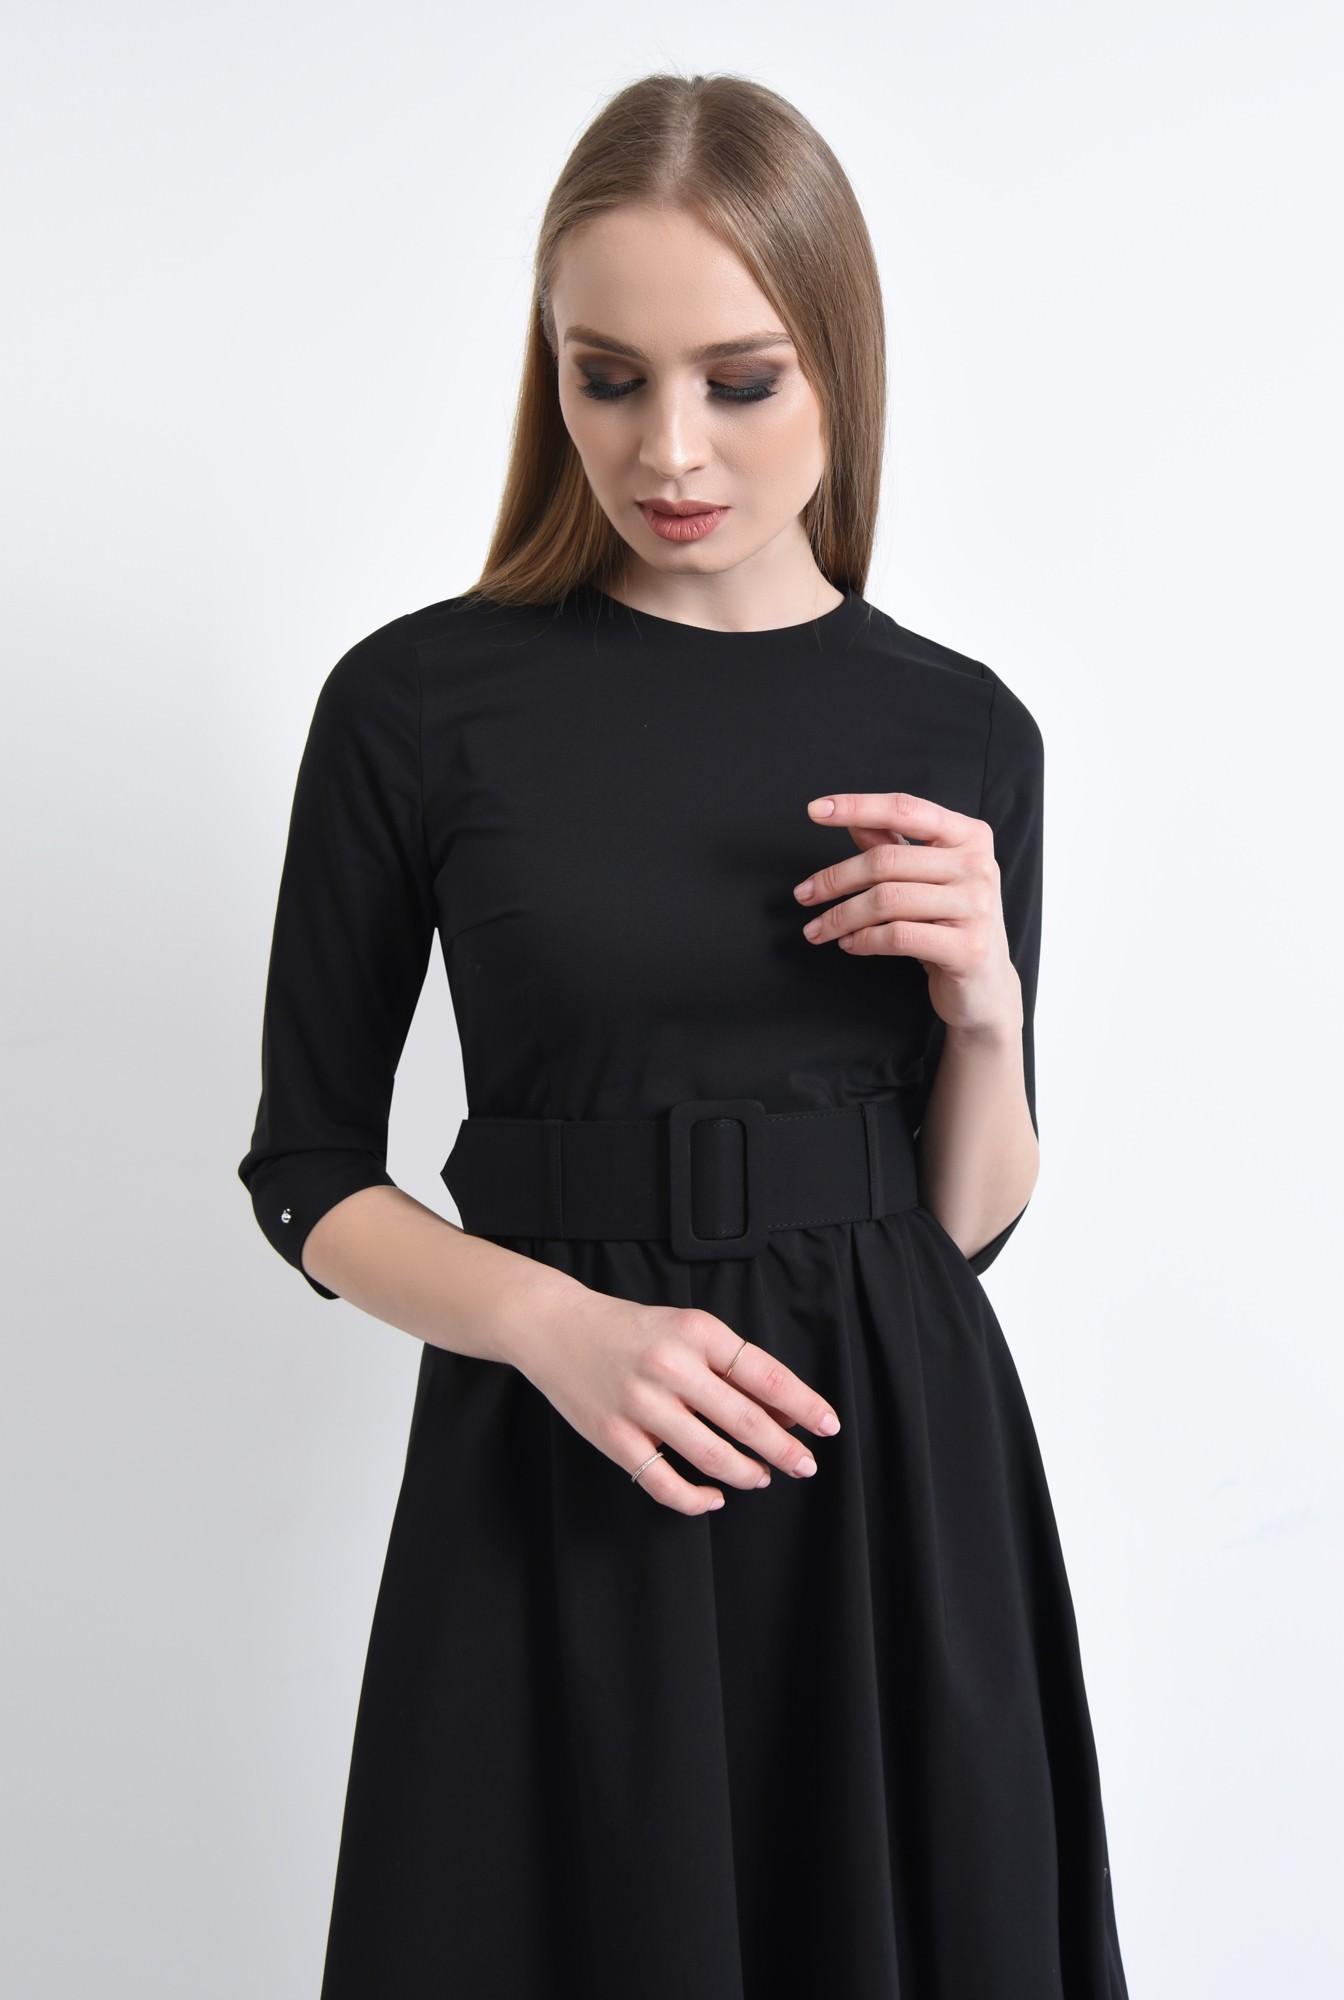 2 - 360 - Rochie casual, centura material textil